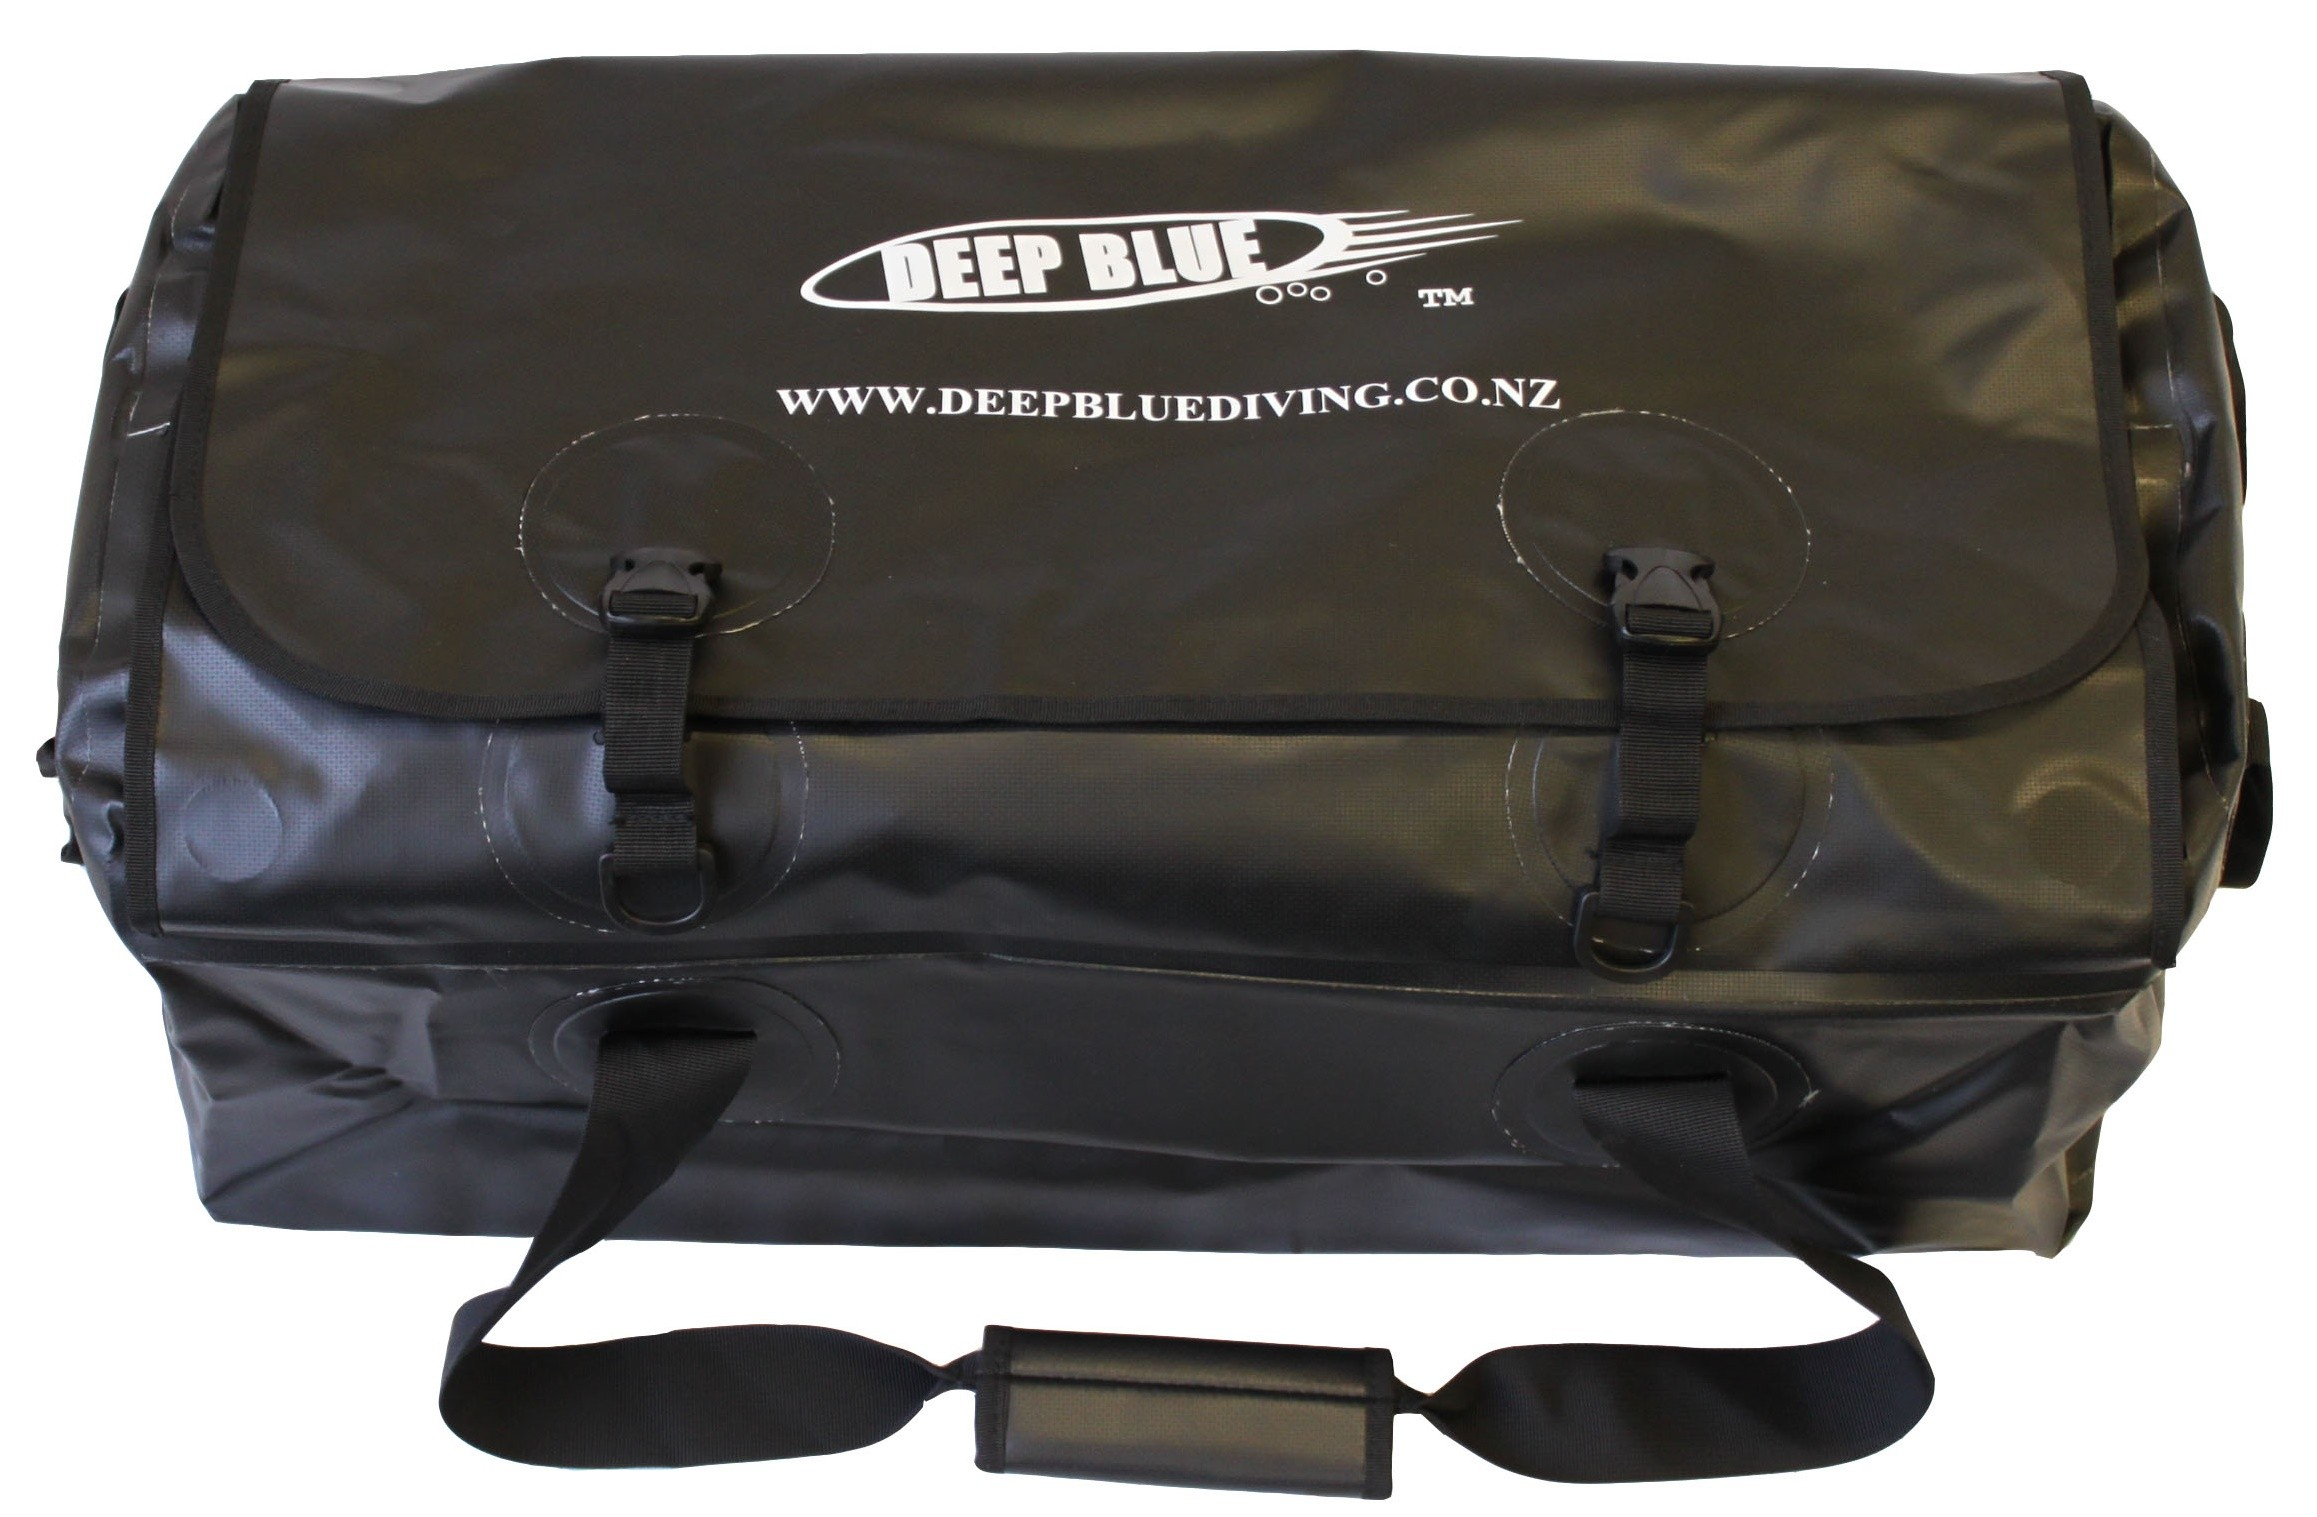 DEEP BLUE - Dive Gear Bag